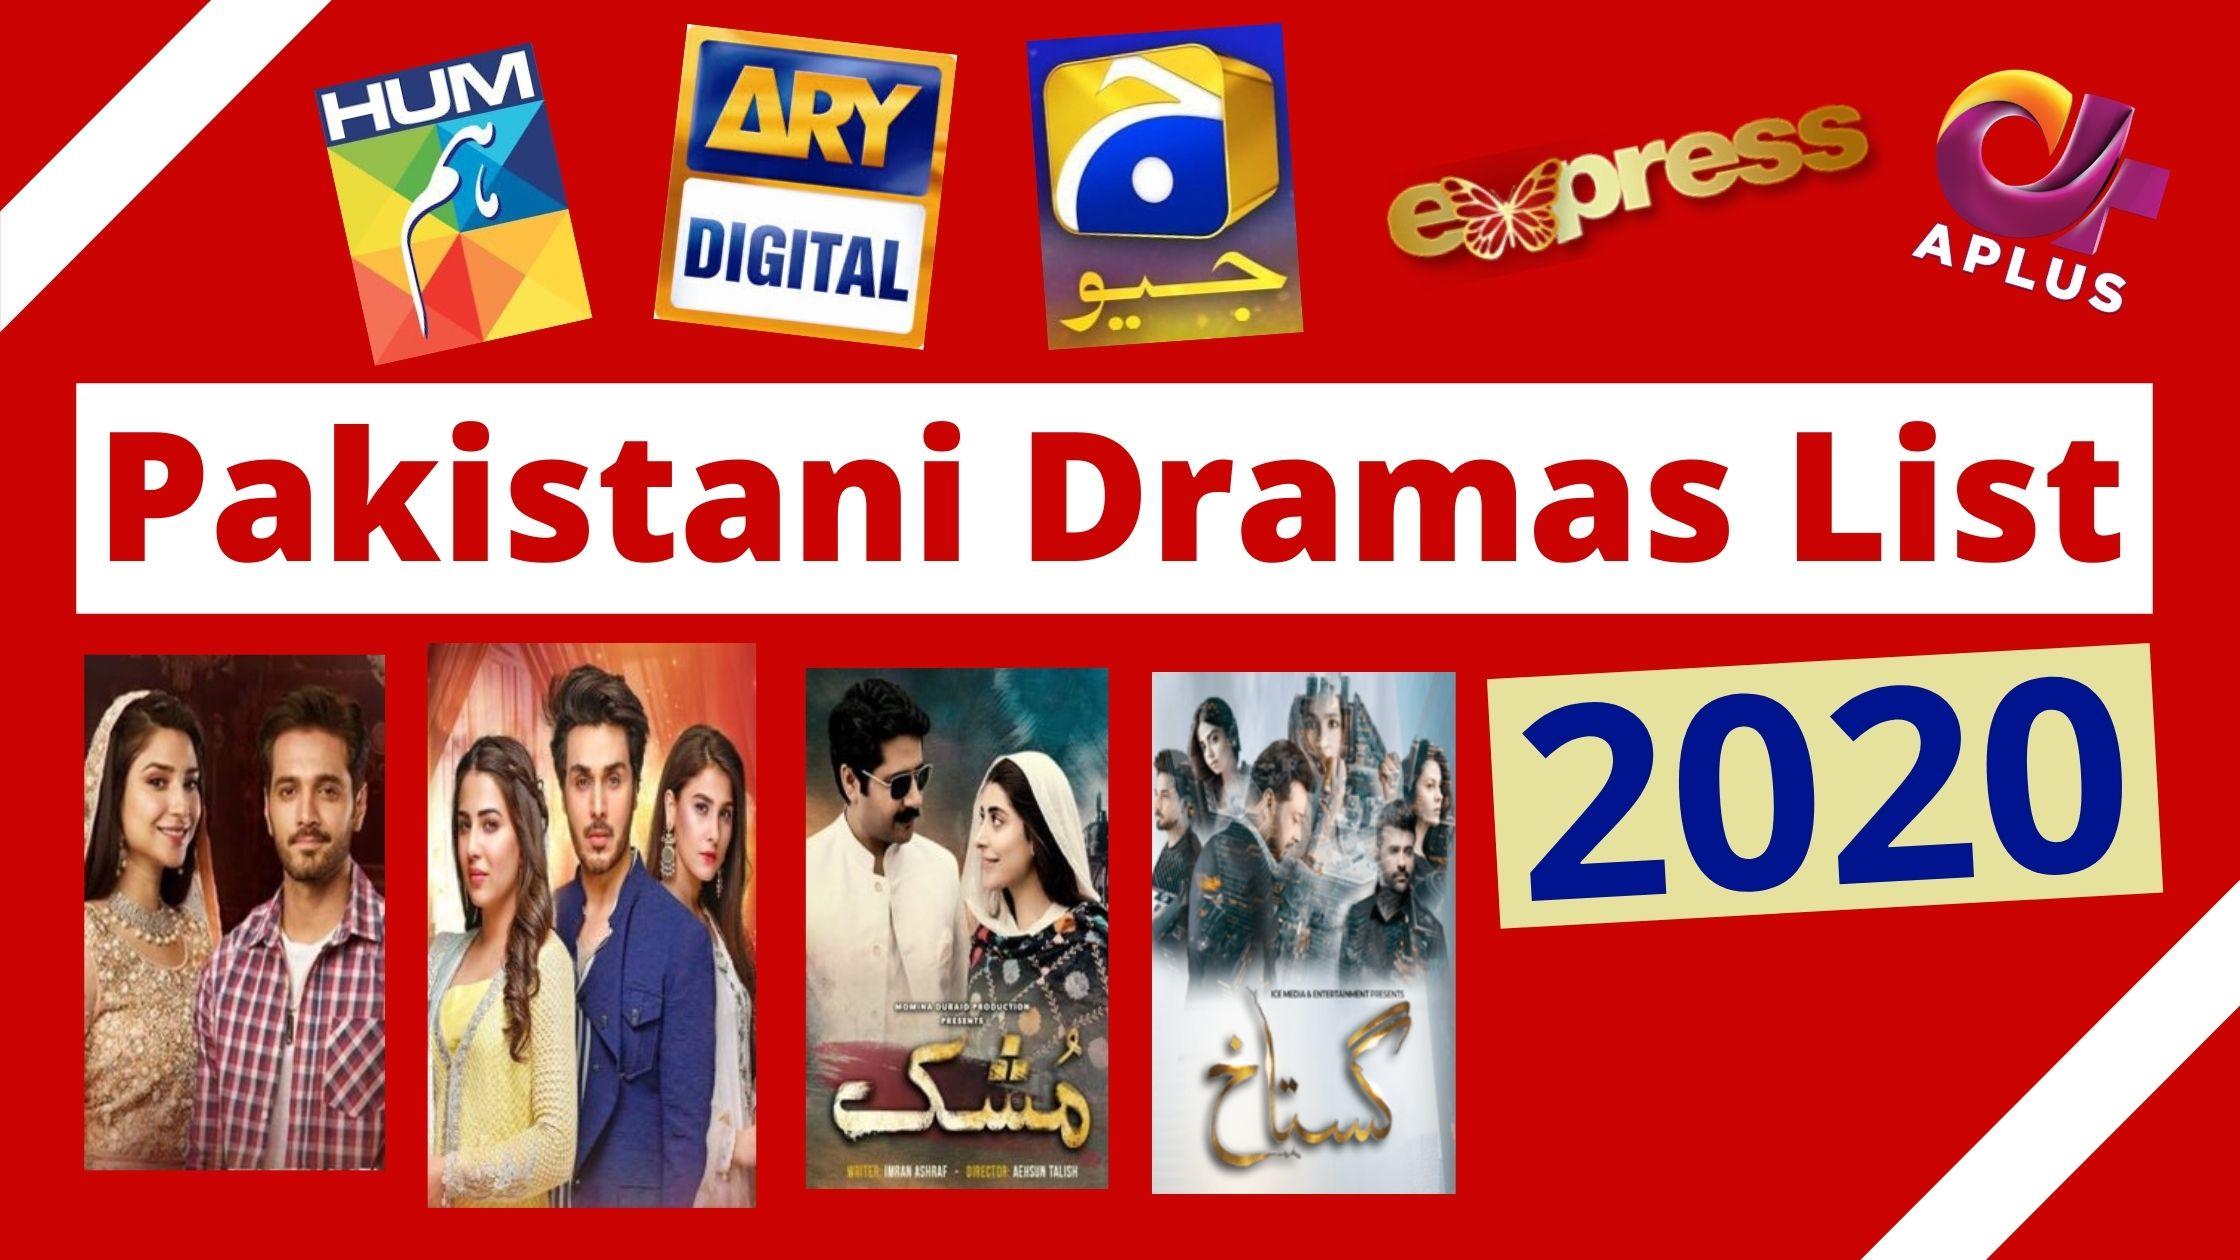 Pakistani Dramas List 2020